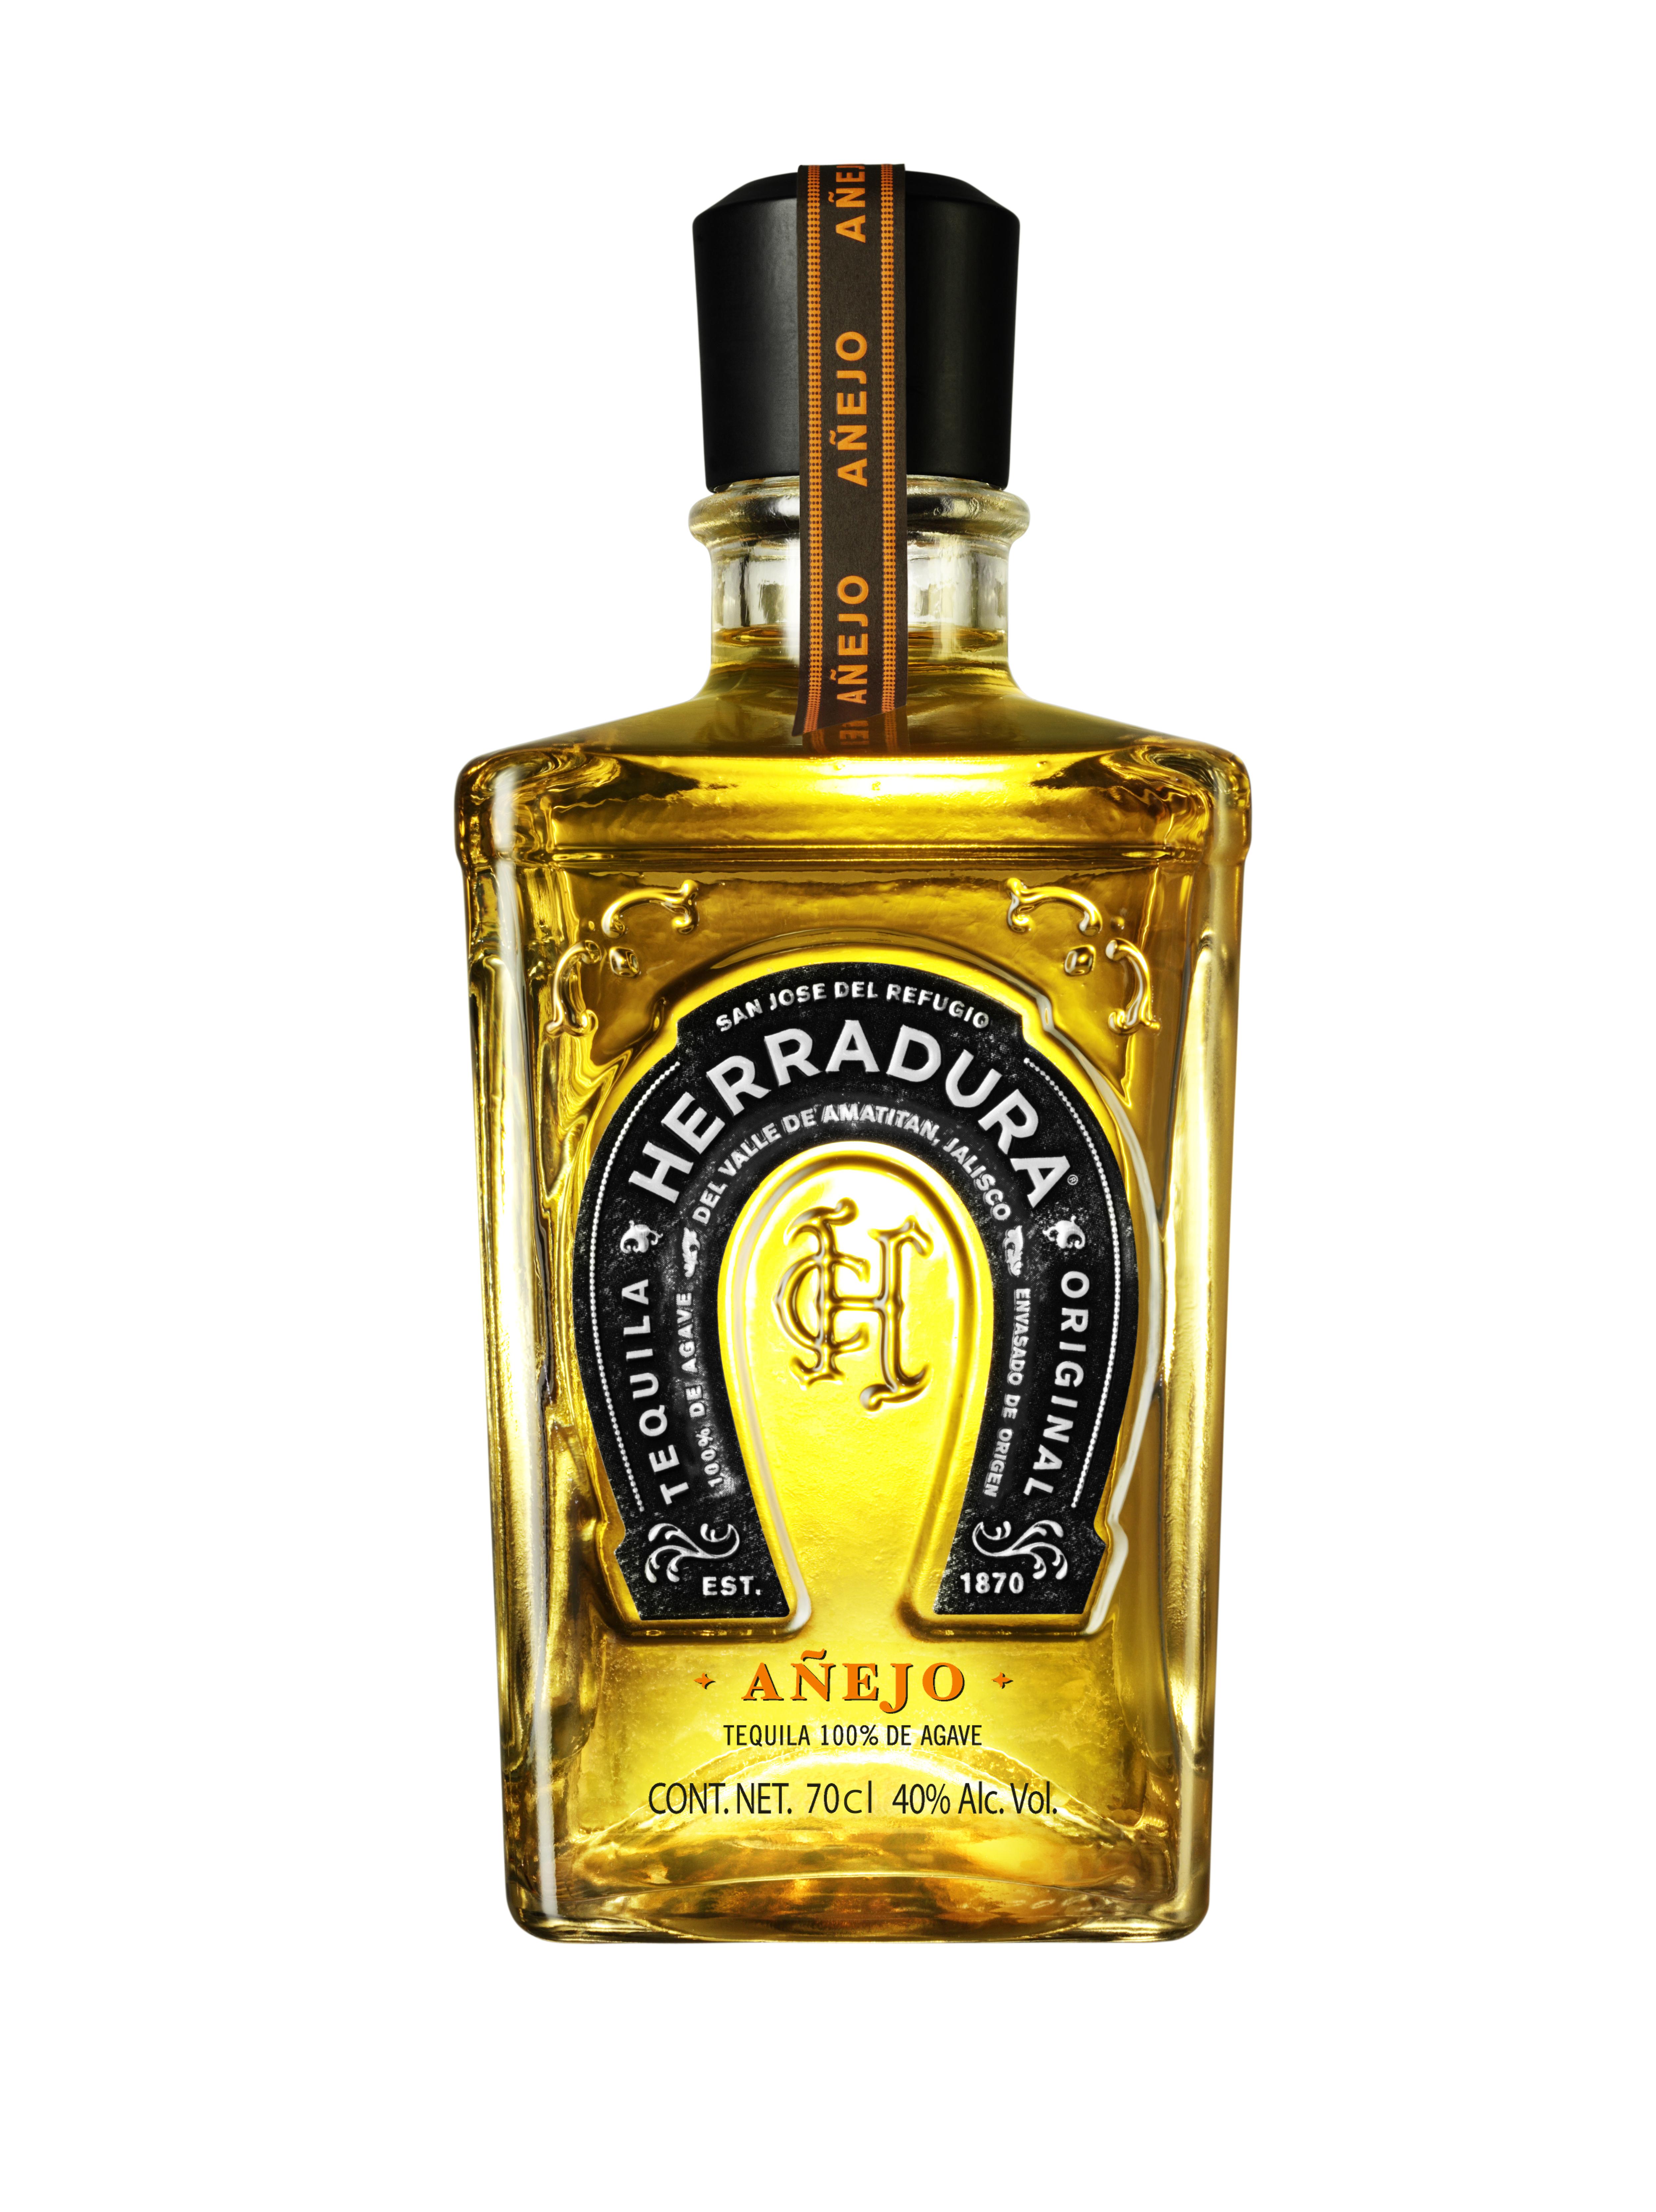 Herradura Anejo Tequila